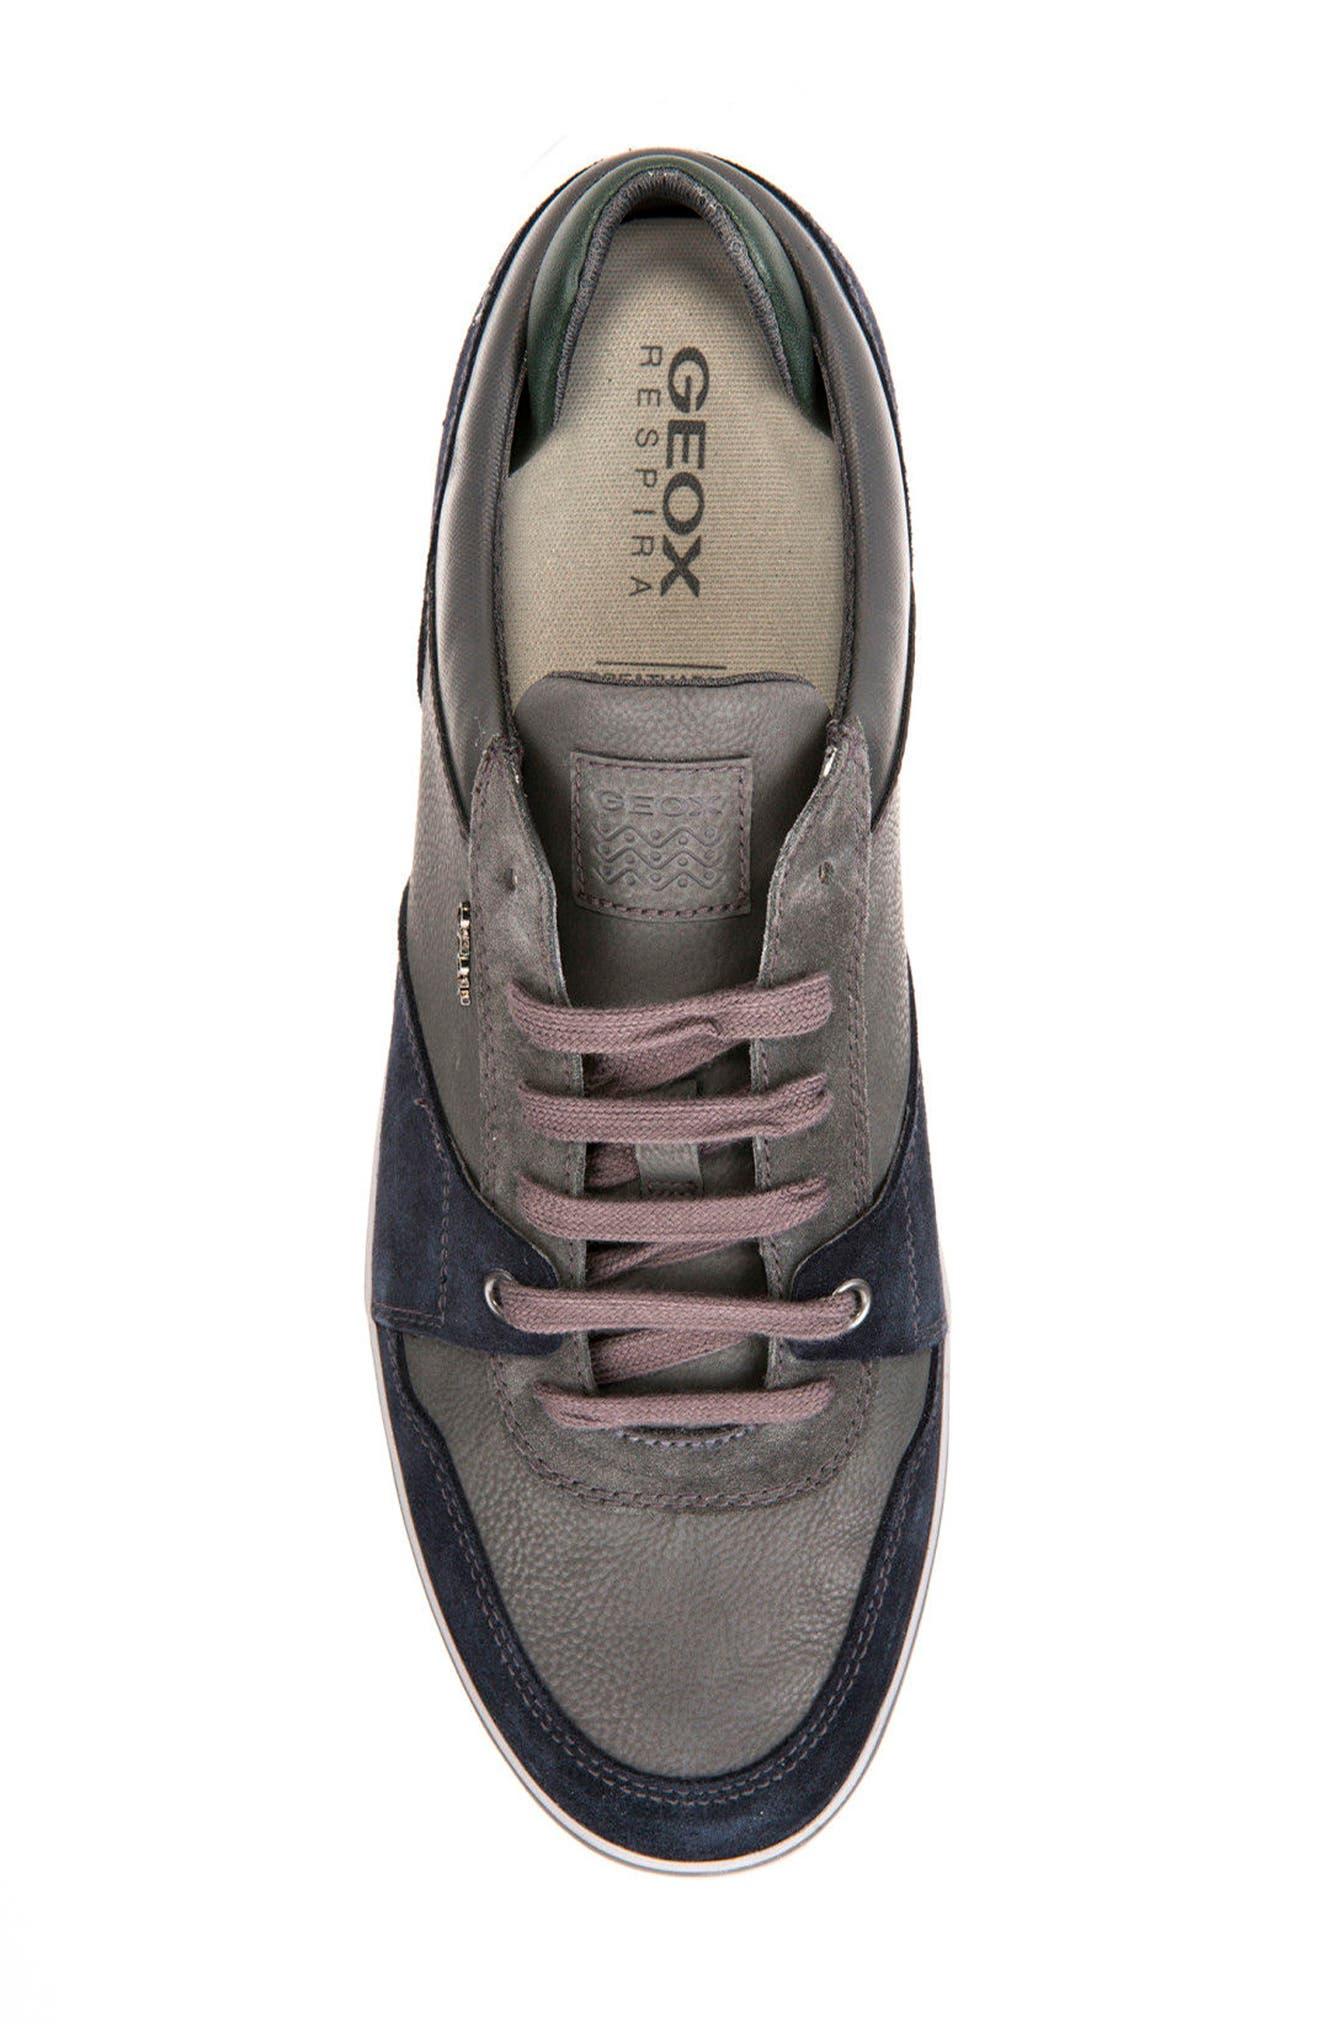 Box 26 Low Top Sneaker,                             Alternate thumbnail 5, color,                             461